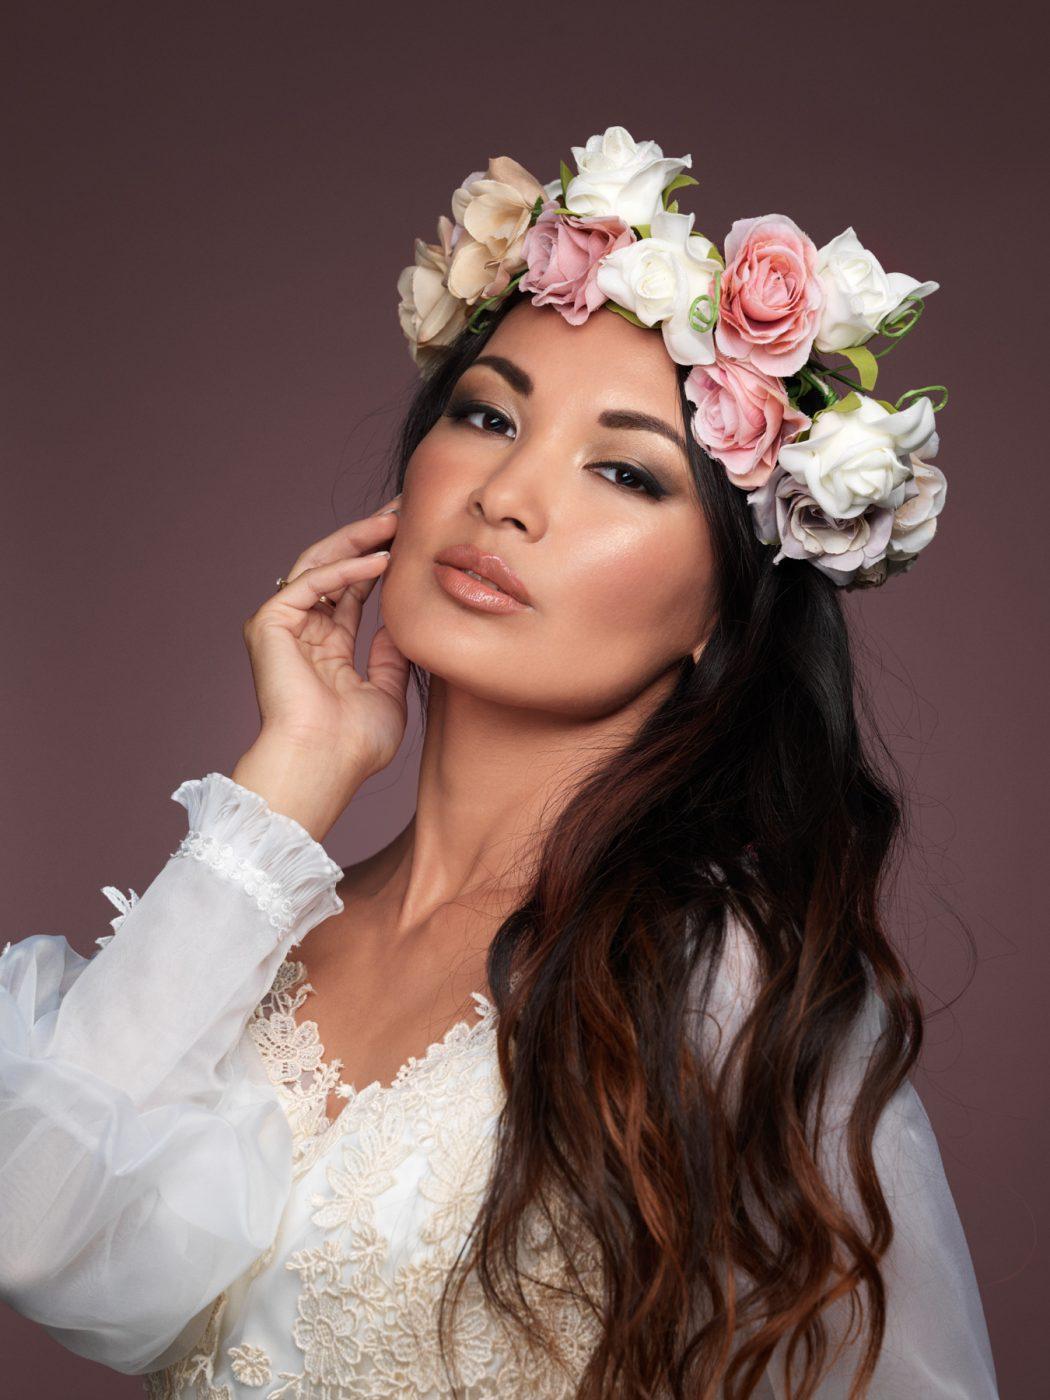 montreal bride makeup, montreal makeup. bridal makeup artist in Montreal, creative makeup